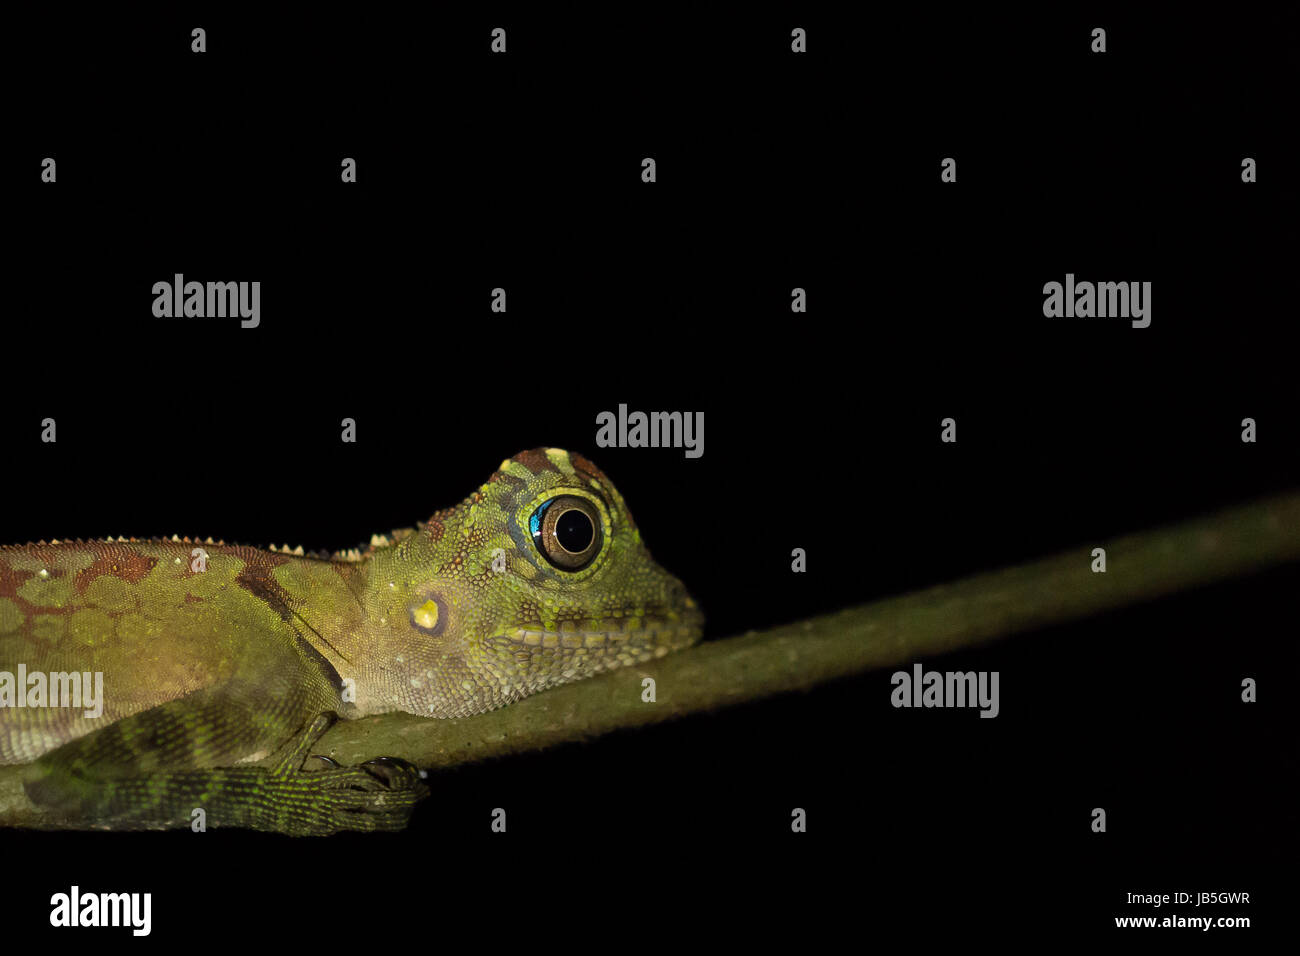 Gecko at night in Ulu Temburong National Park, Temburong District, Brunei - Stock Image